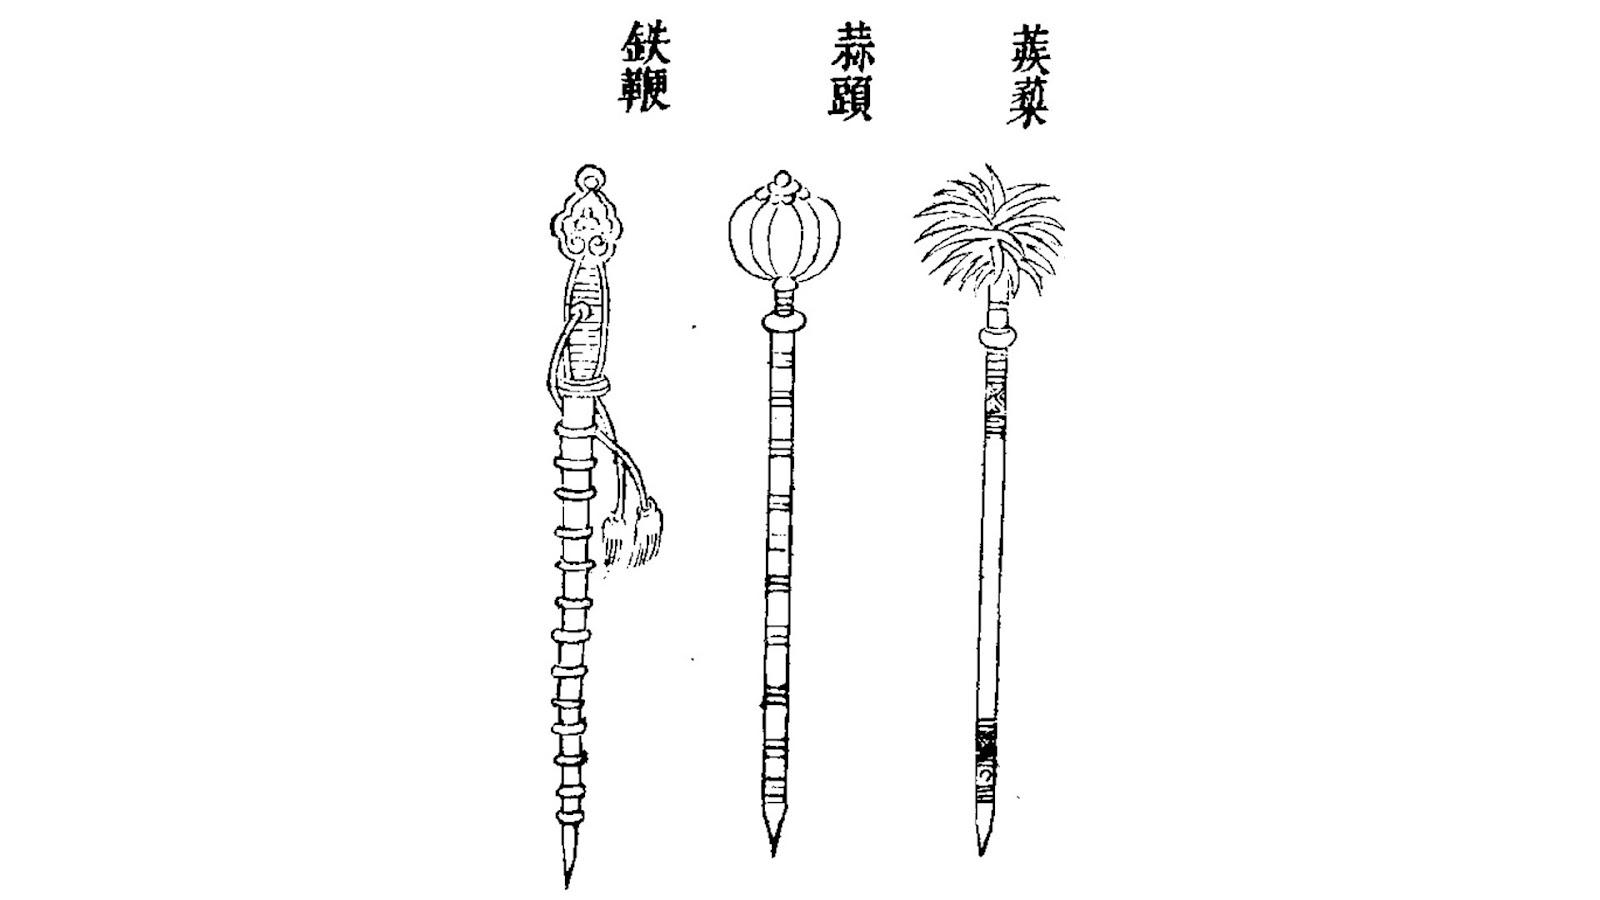 History of Gunpowder: Wujing Zongyao Maces